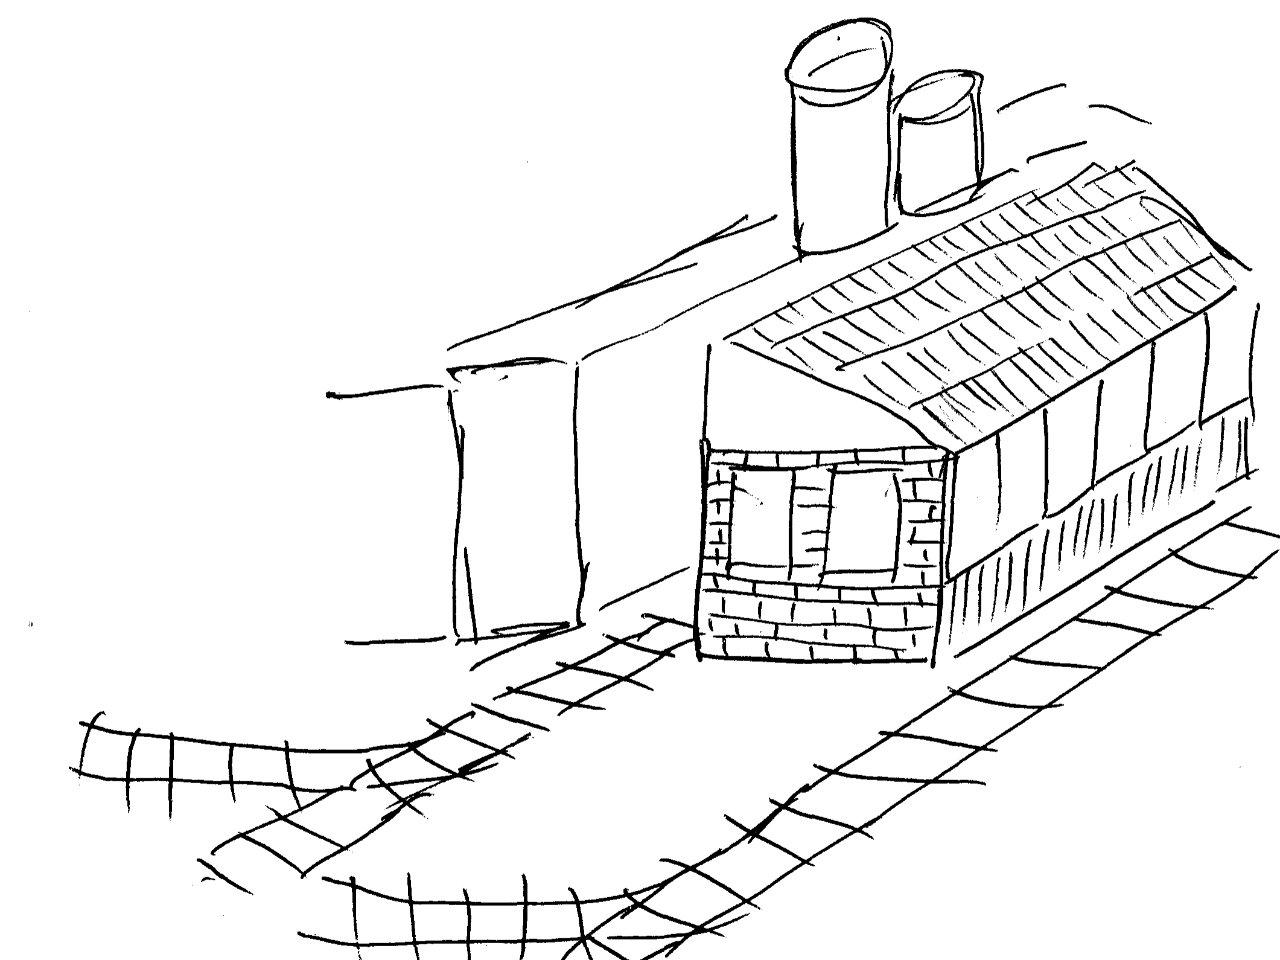 Wellpappe-Gestaltung_01_Skizze.jpg